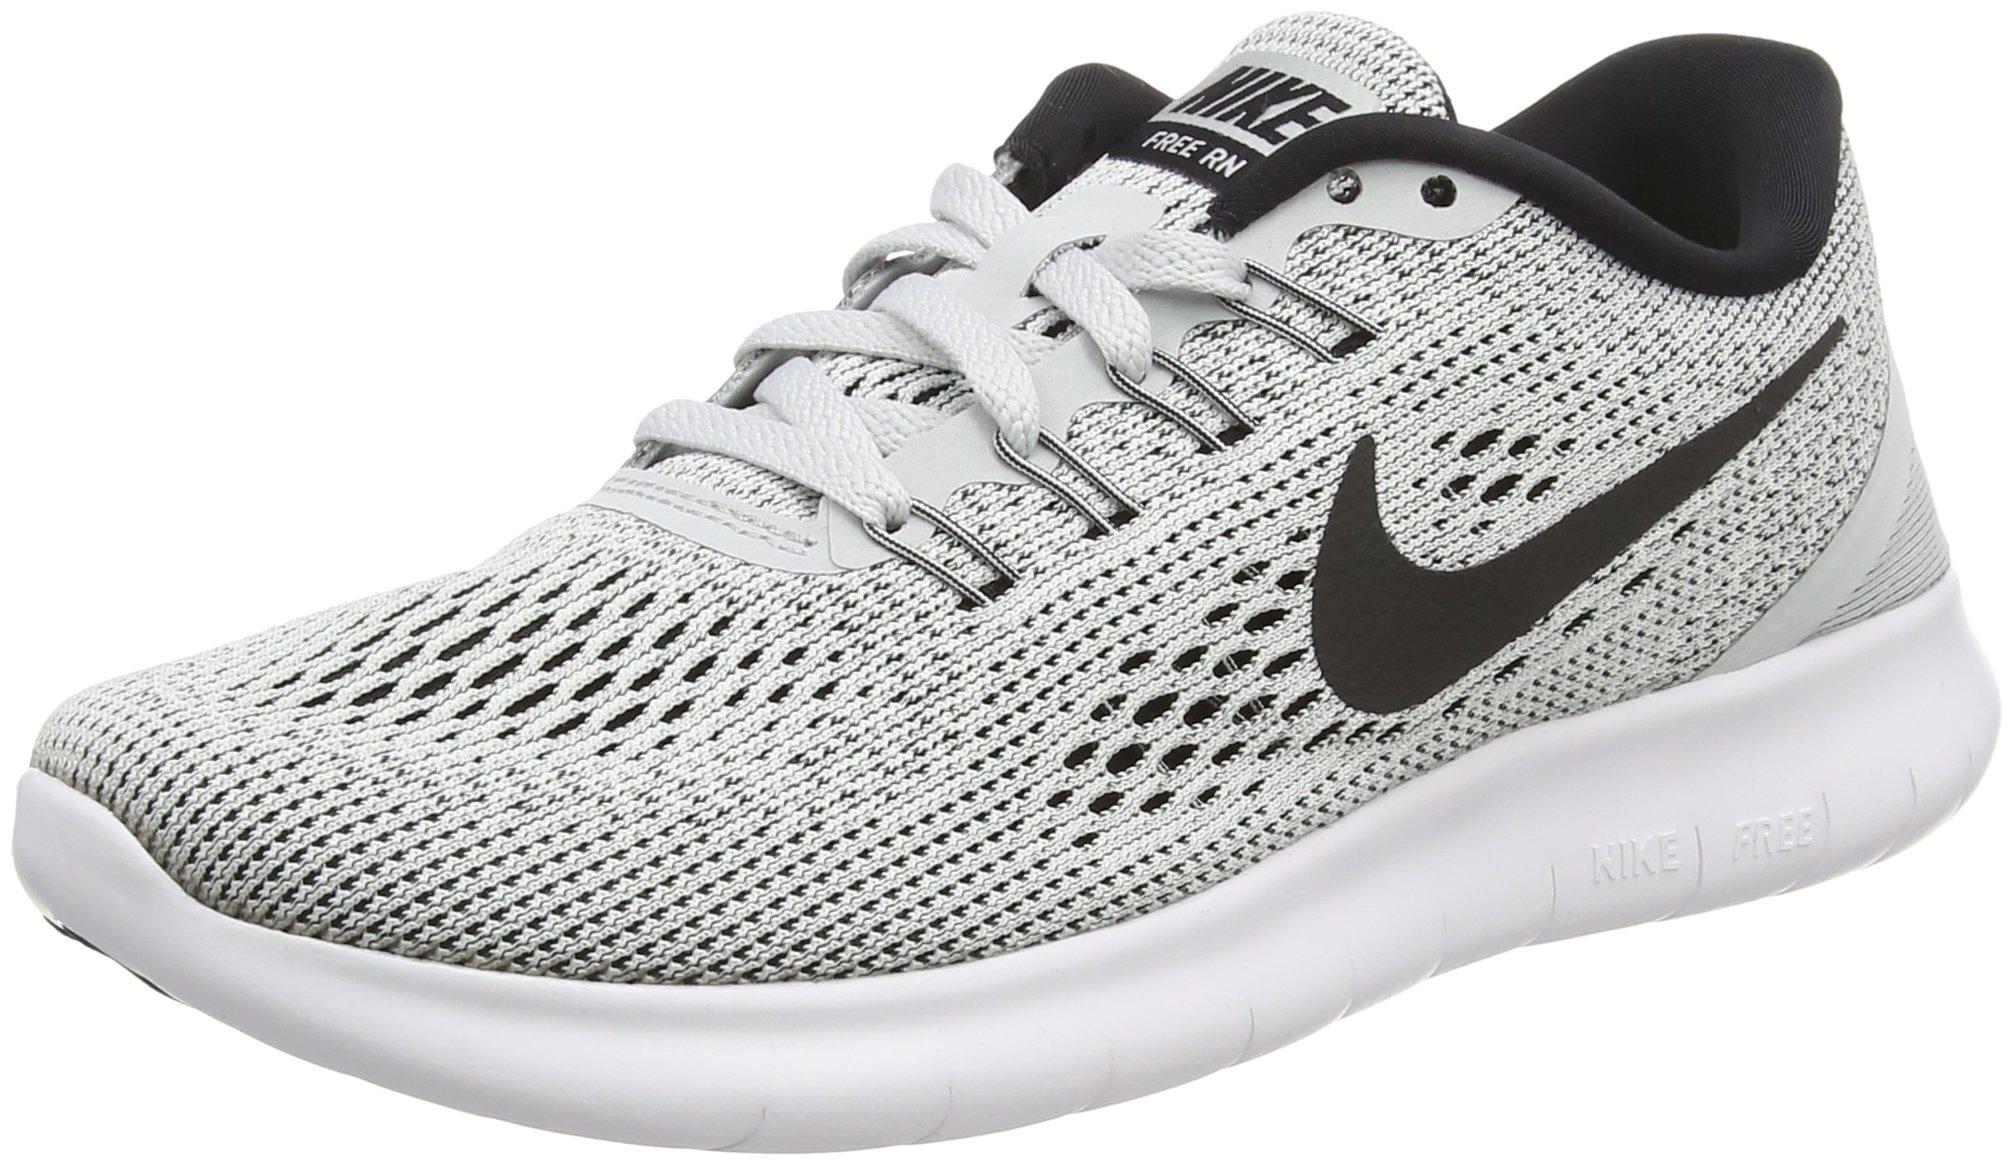 Nike Women's Free RN Running Shoes White/Pure Platinum/Black 5 B(M) US